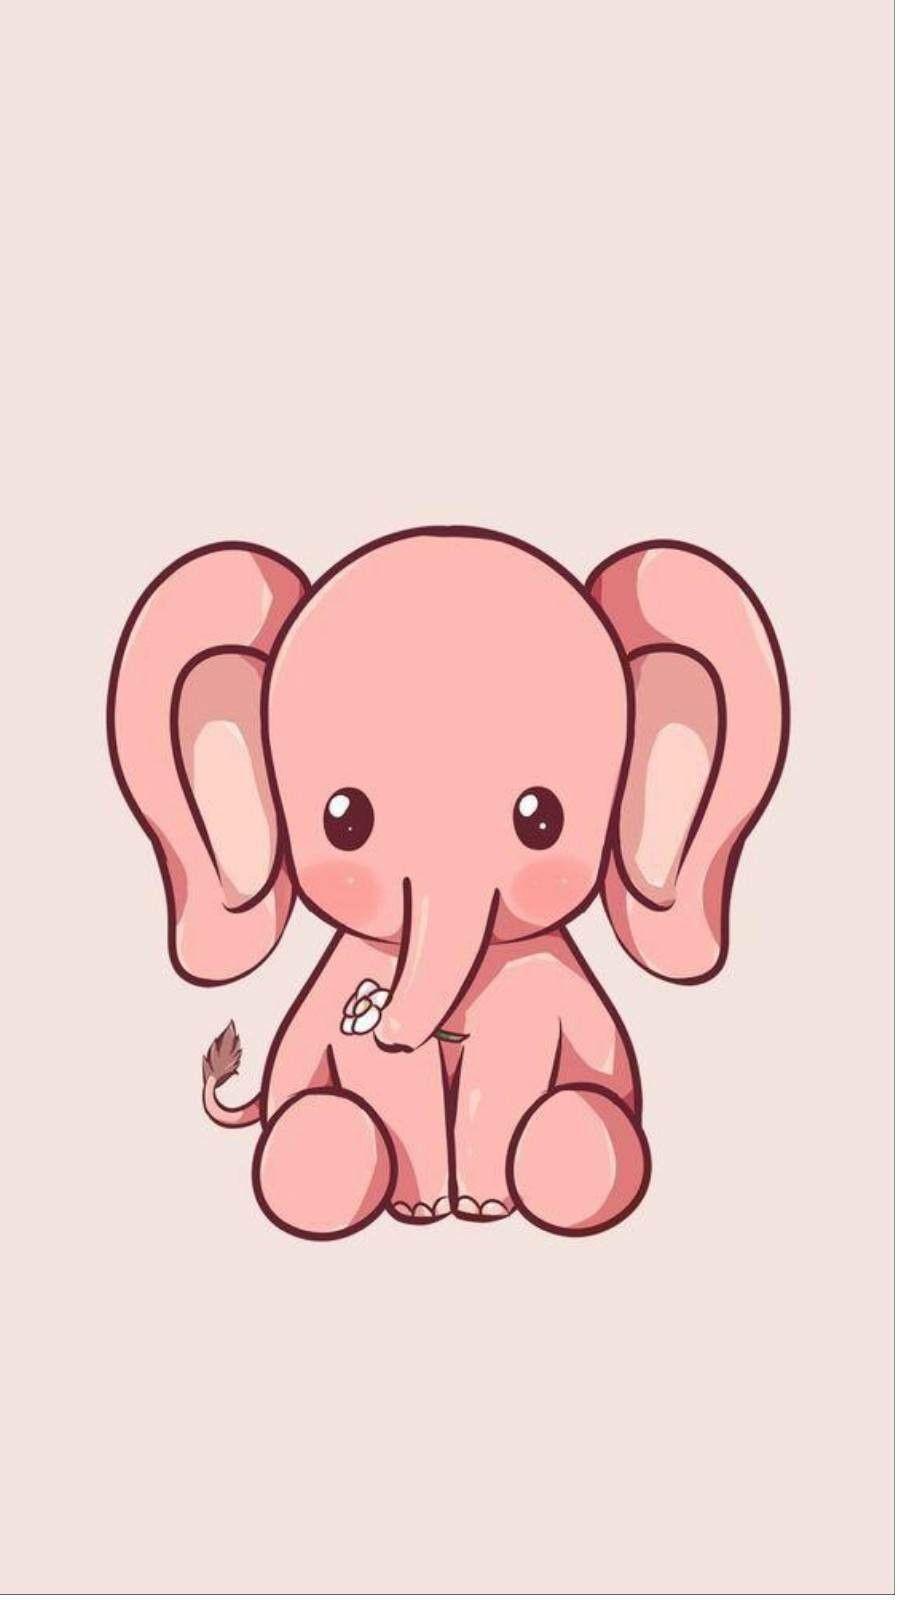 Pink Elephant Wallpaper Elephant Iphone Wallpaper Wallpaper Iphone Cute Cute Elephant Drawing